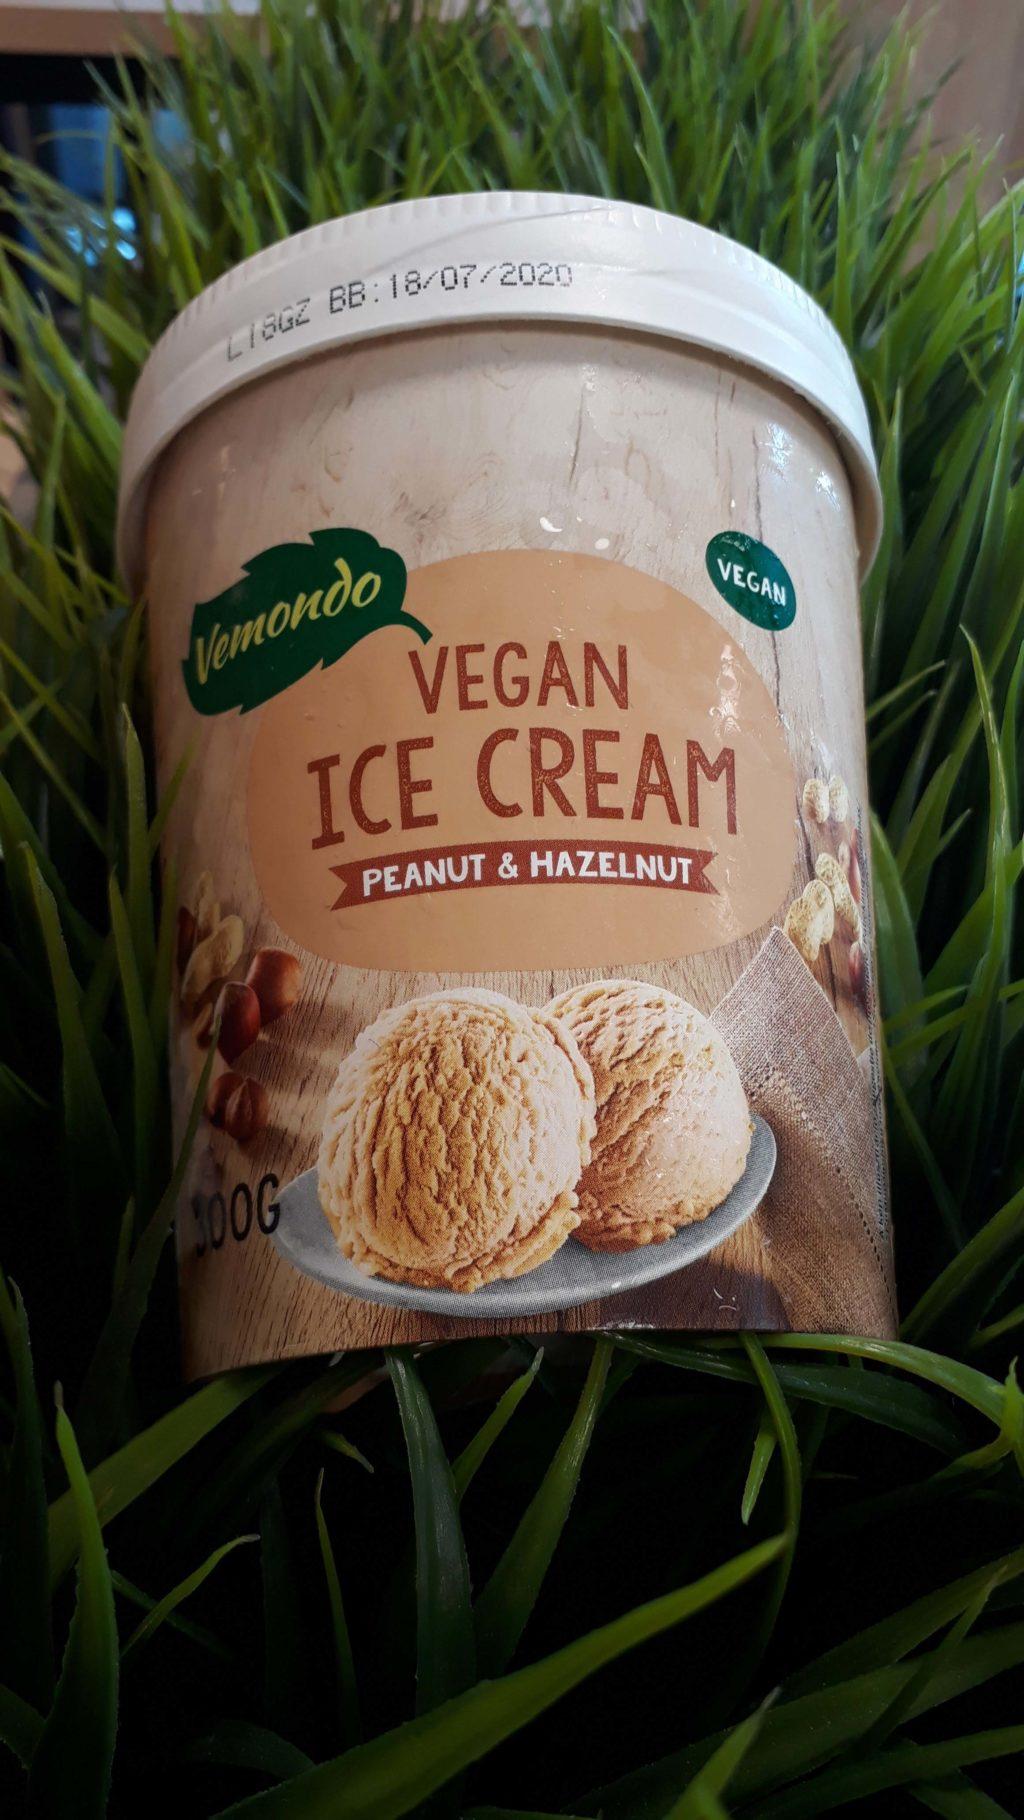 Vegan ice cream with peanut hazelnut flavor